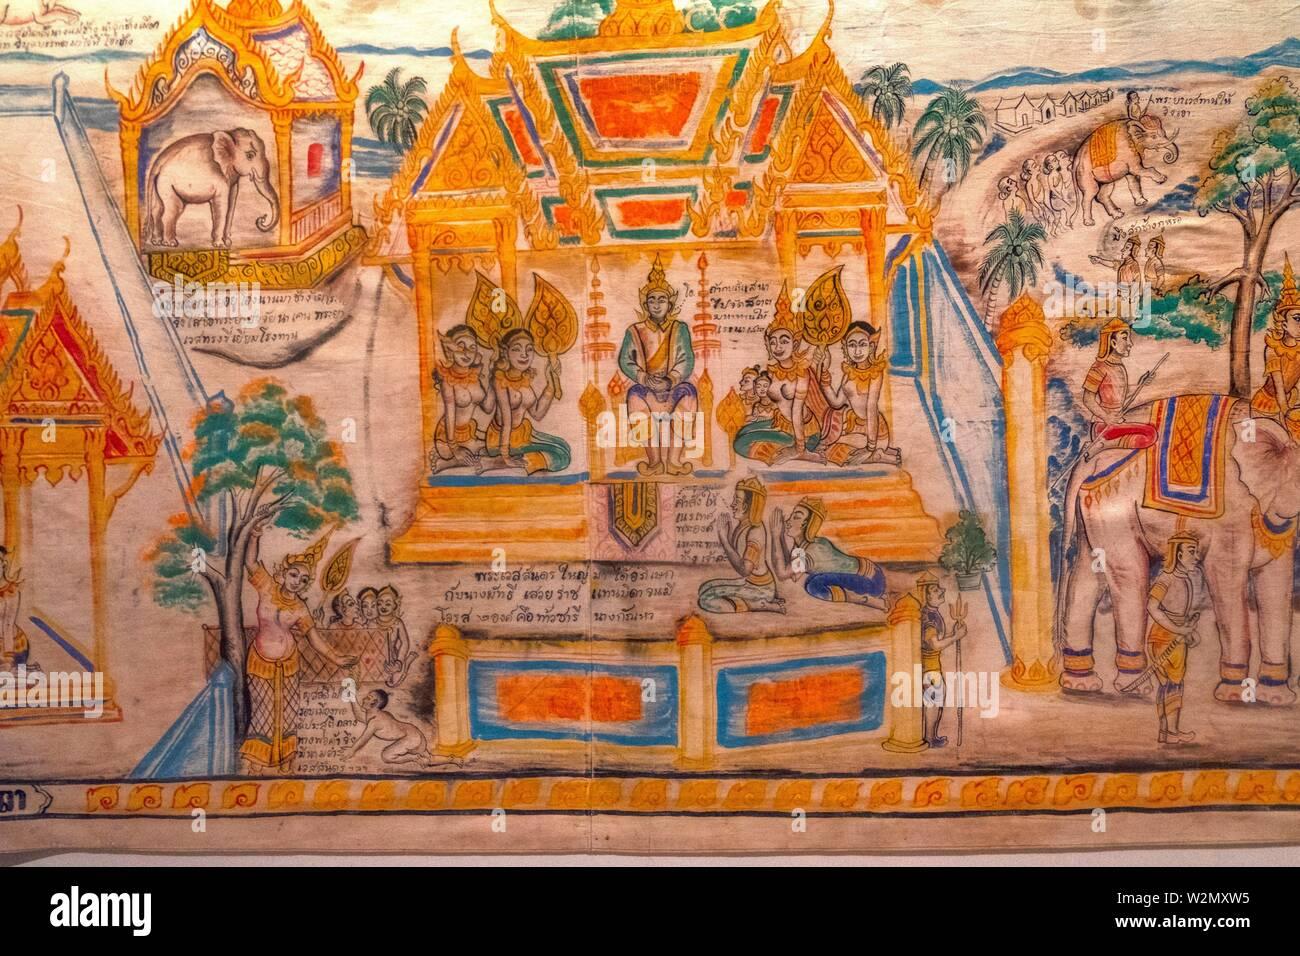 Singapore, Asian Civilisations Museum: 'Vessantara Jataka' scroll, by Sopha Pangchat (1906-1966). Northeast Thailand, Ubon Ratchattani province, - Stock Image